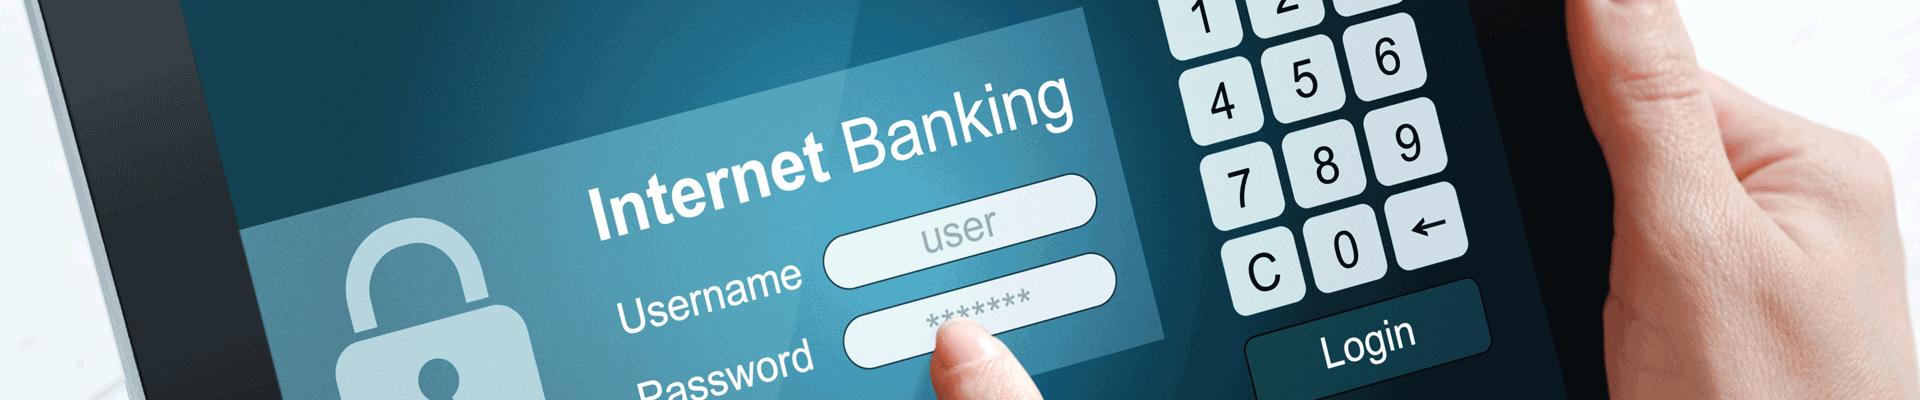 mauritius internet banking